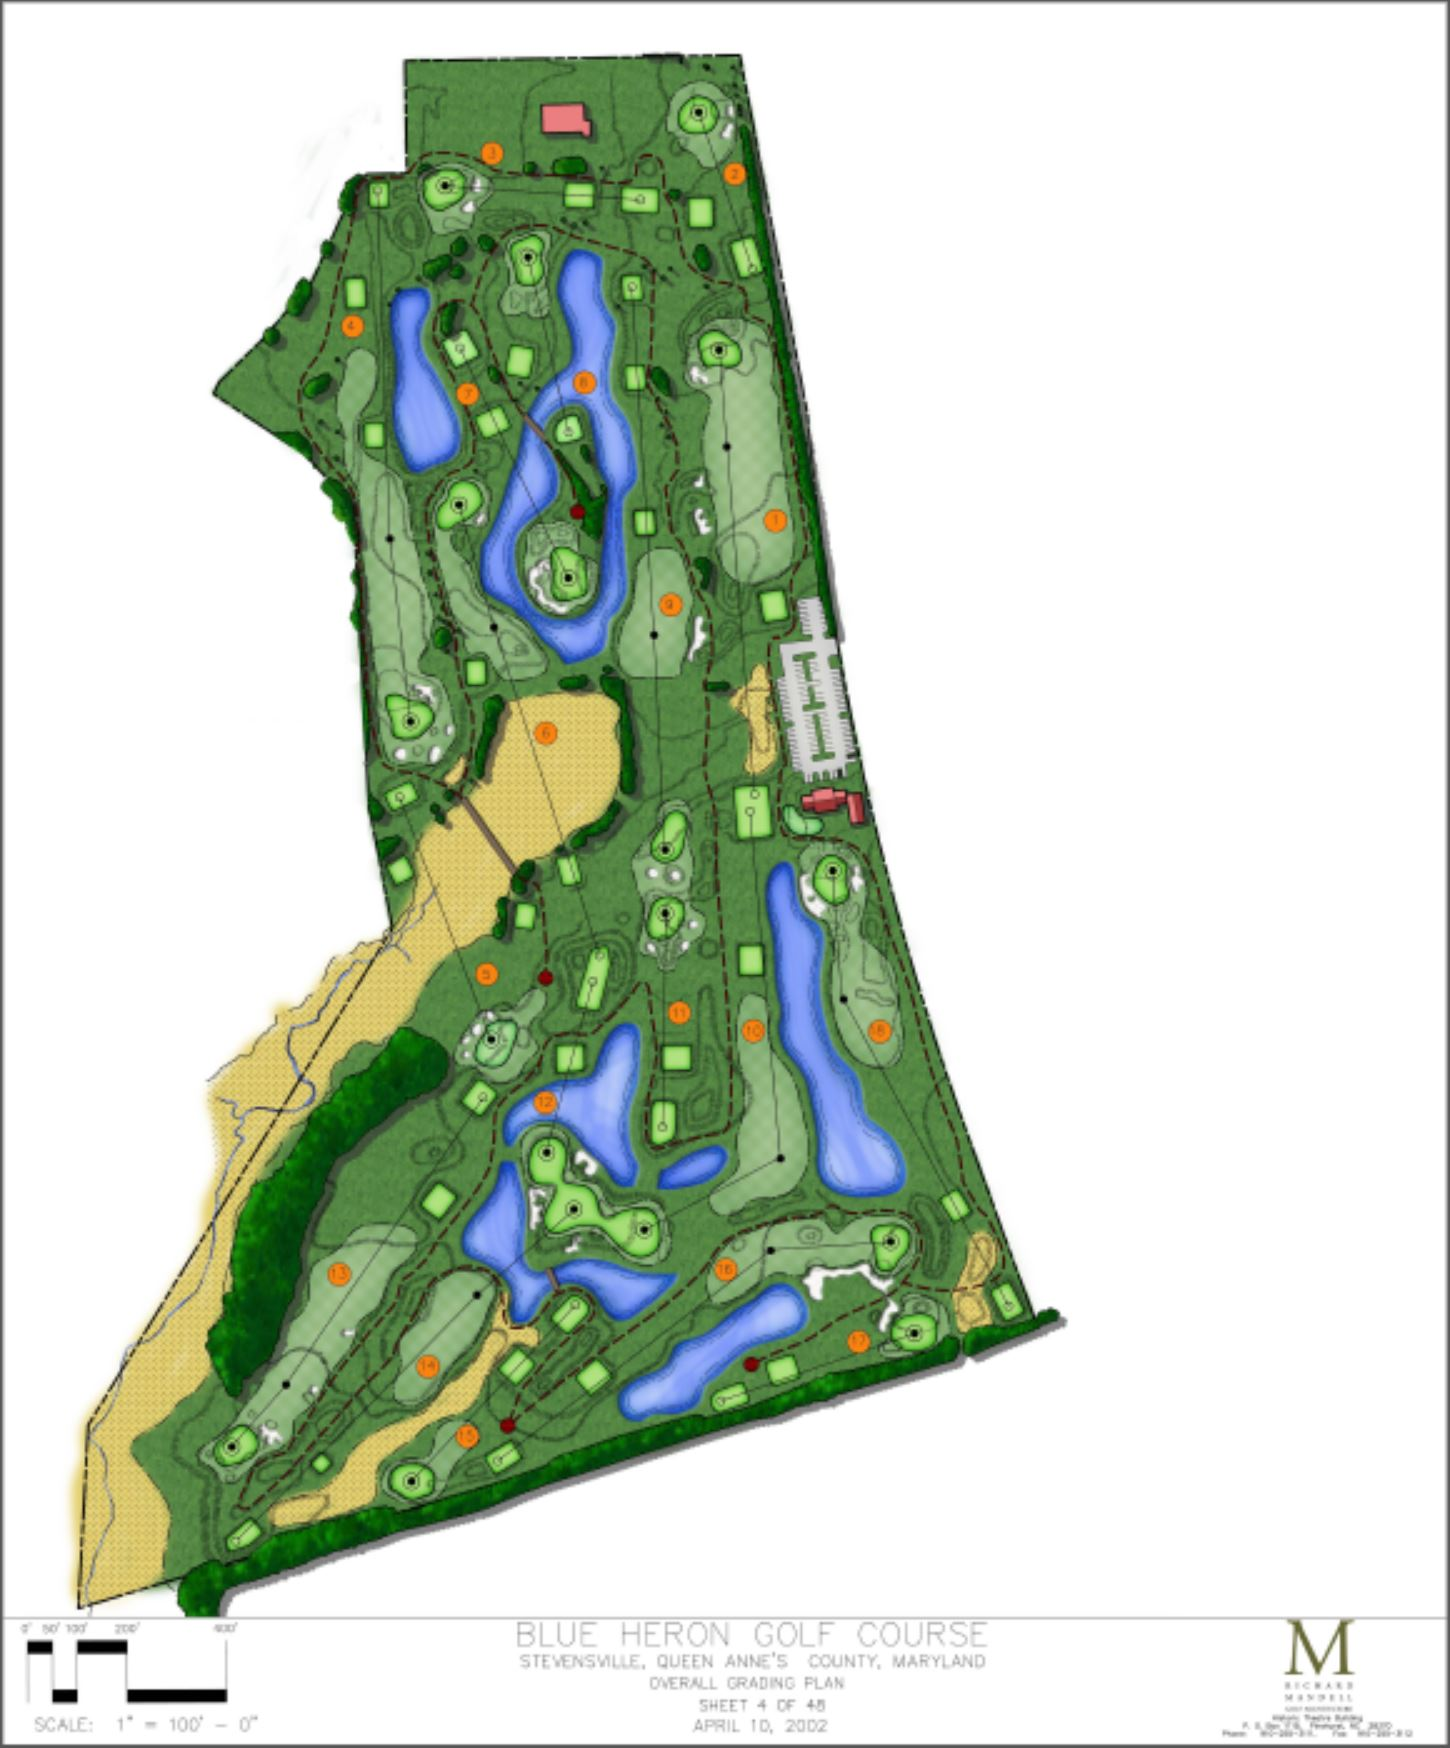 Blue Heron Golf Course Master Plan